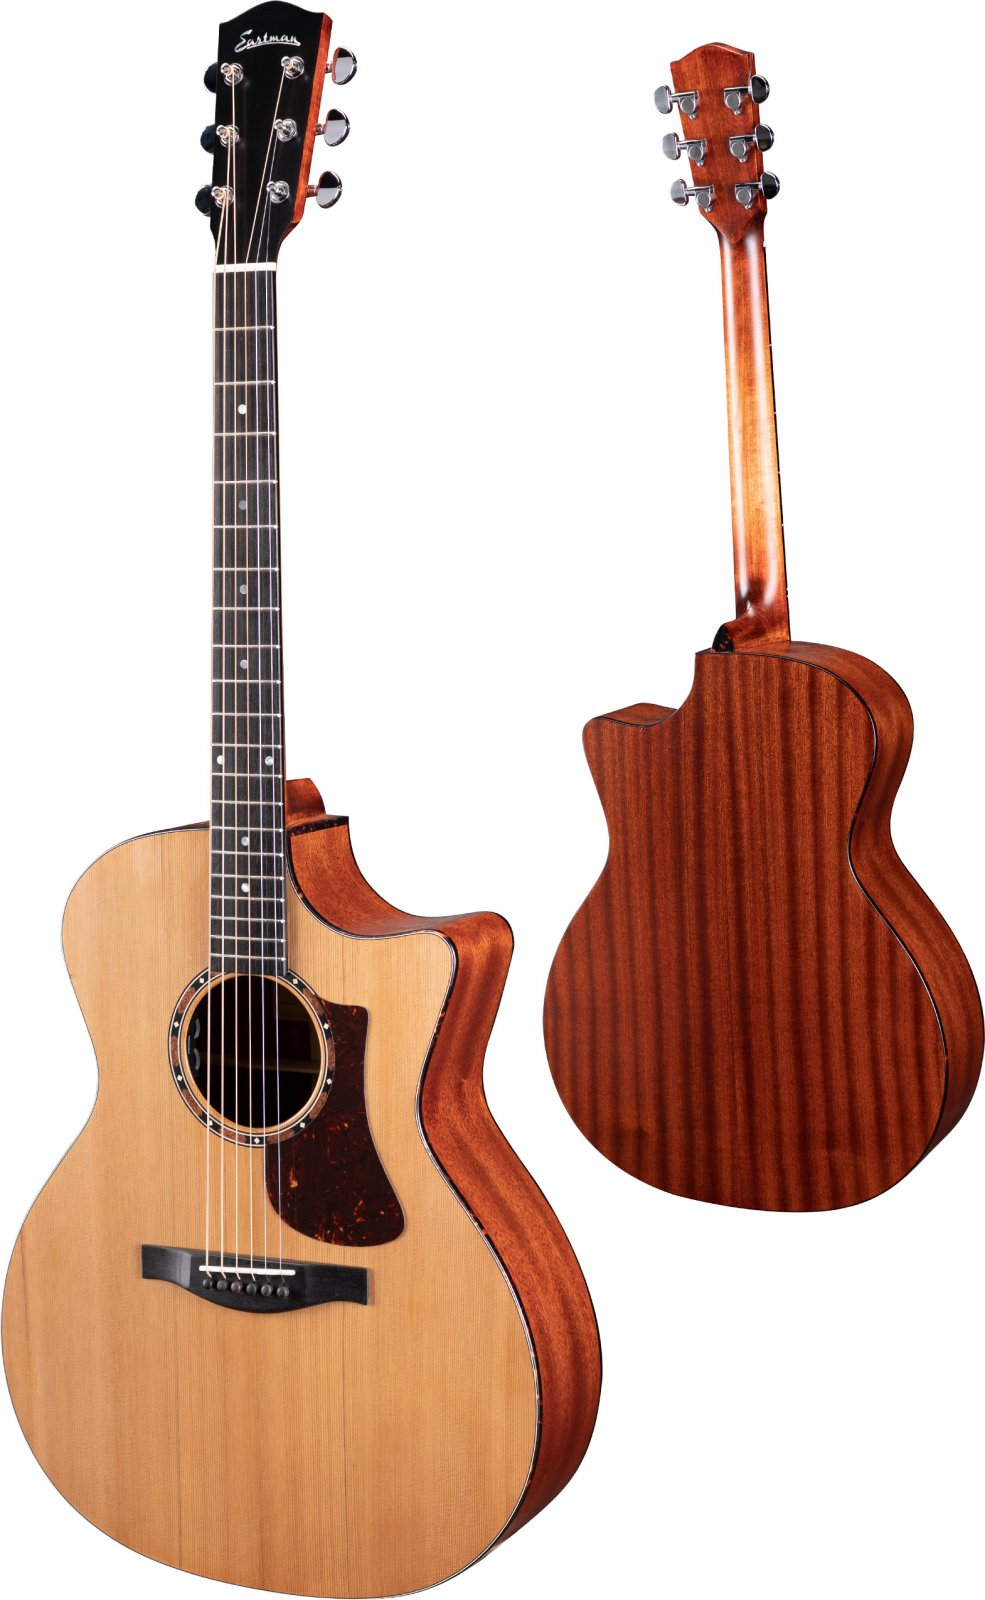 Eastman Cedar Top Grand Auditorium Cutaway Guitar AC122-2CE W/Fishman Pickup & Padded Gig Bag